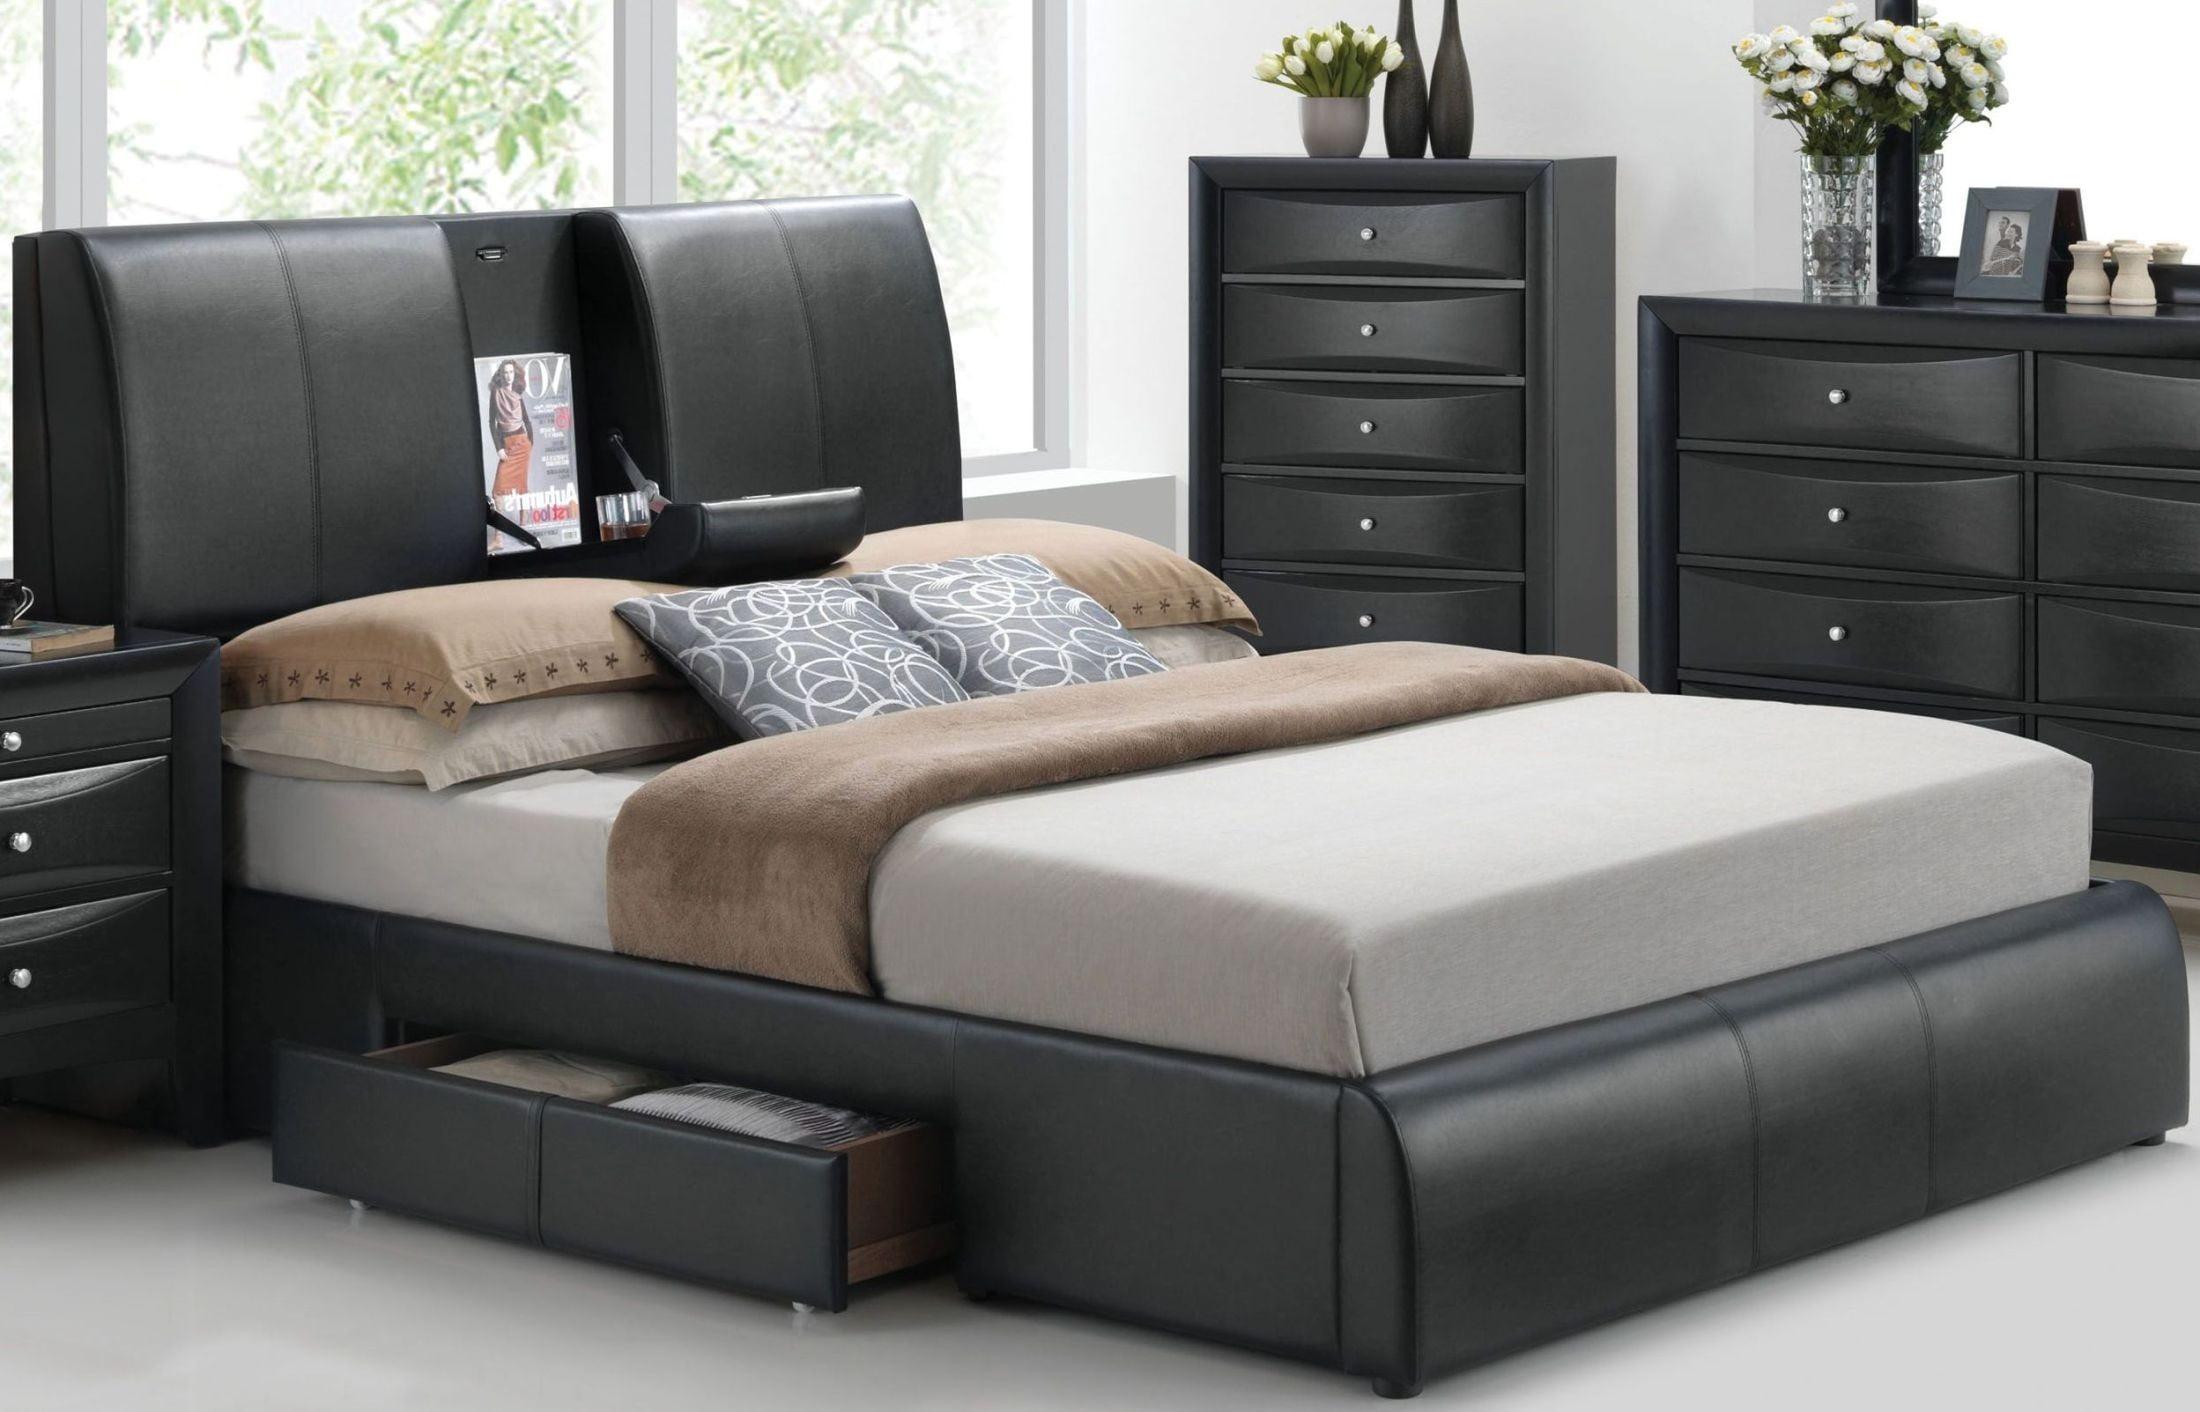 Kofi Black Queen Upholstered Platform Storage Bed from Acme  Coleman Furniture